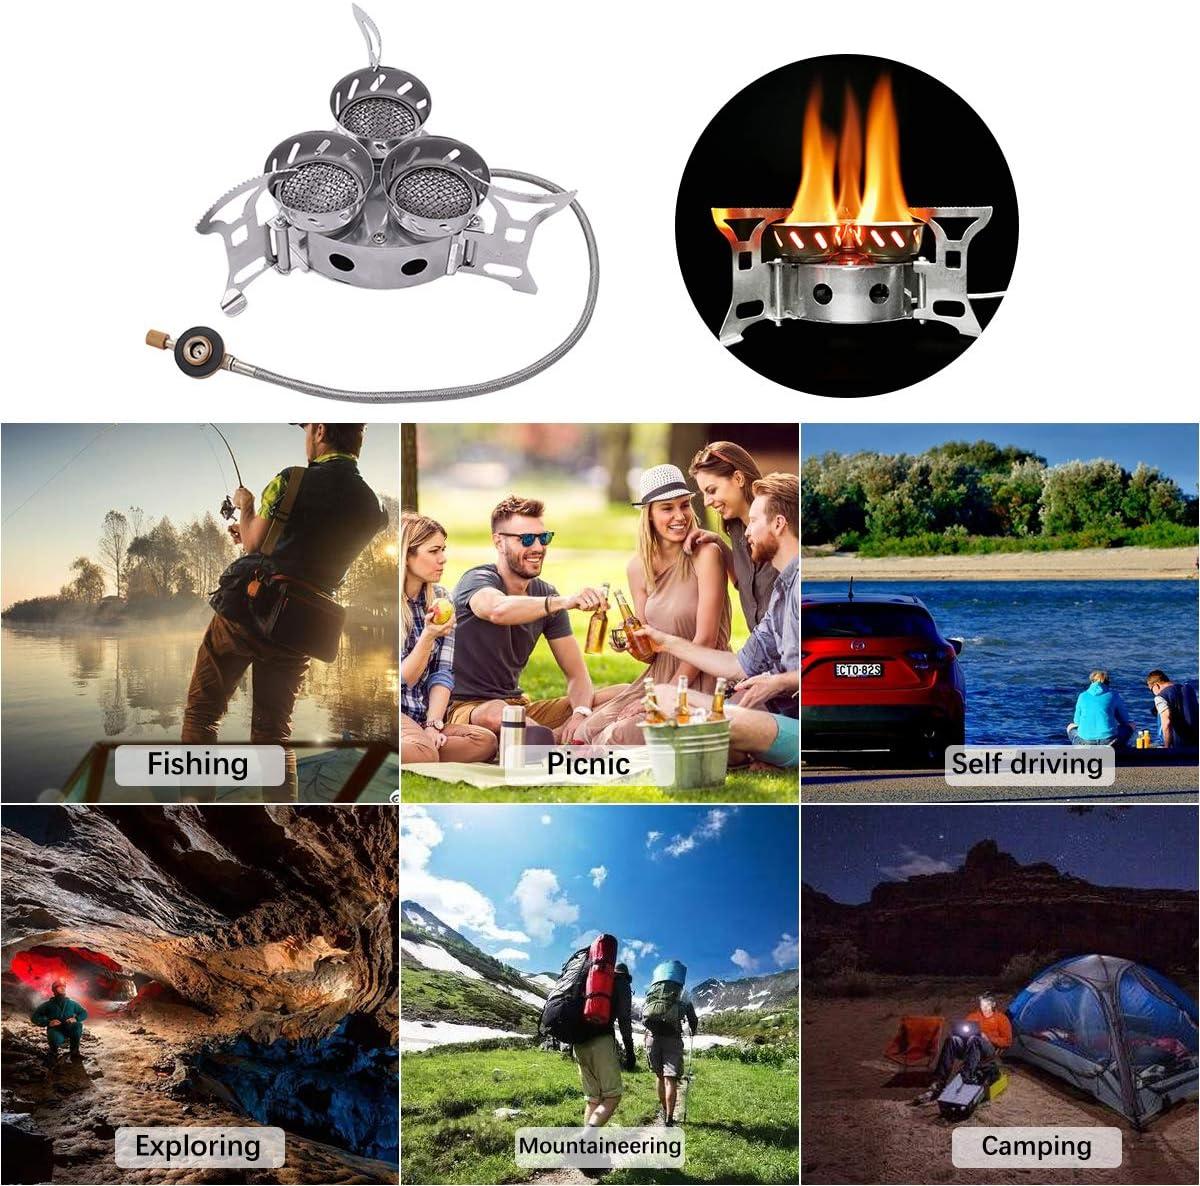 Estufa de Camping Gas Plegable, Hornillos portátiles Tres Núcleos Quemador de Cocina Estufa de Horno Dividida a Prueba de Viento con Encendido ...